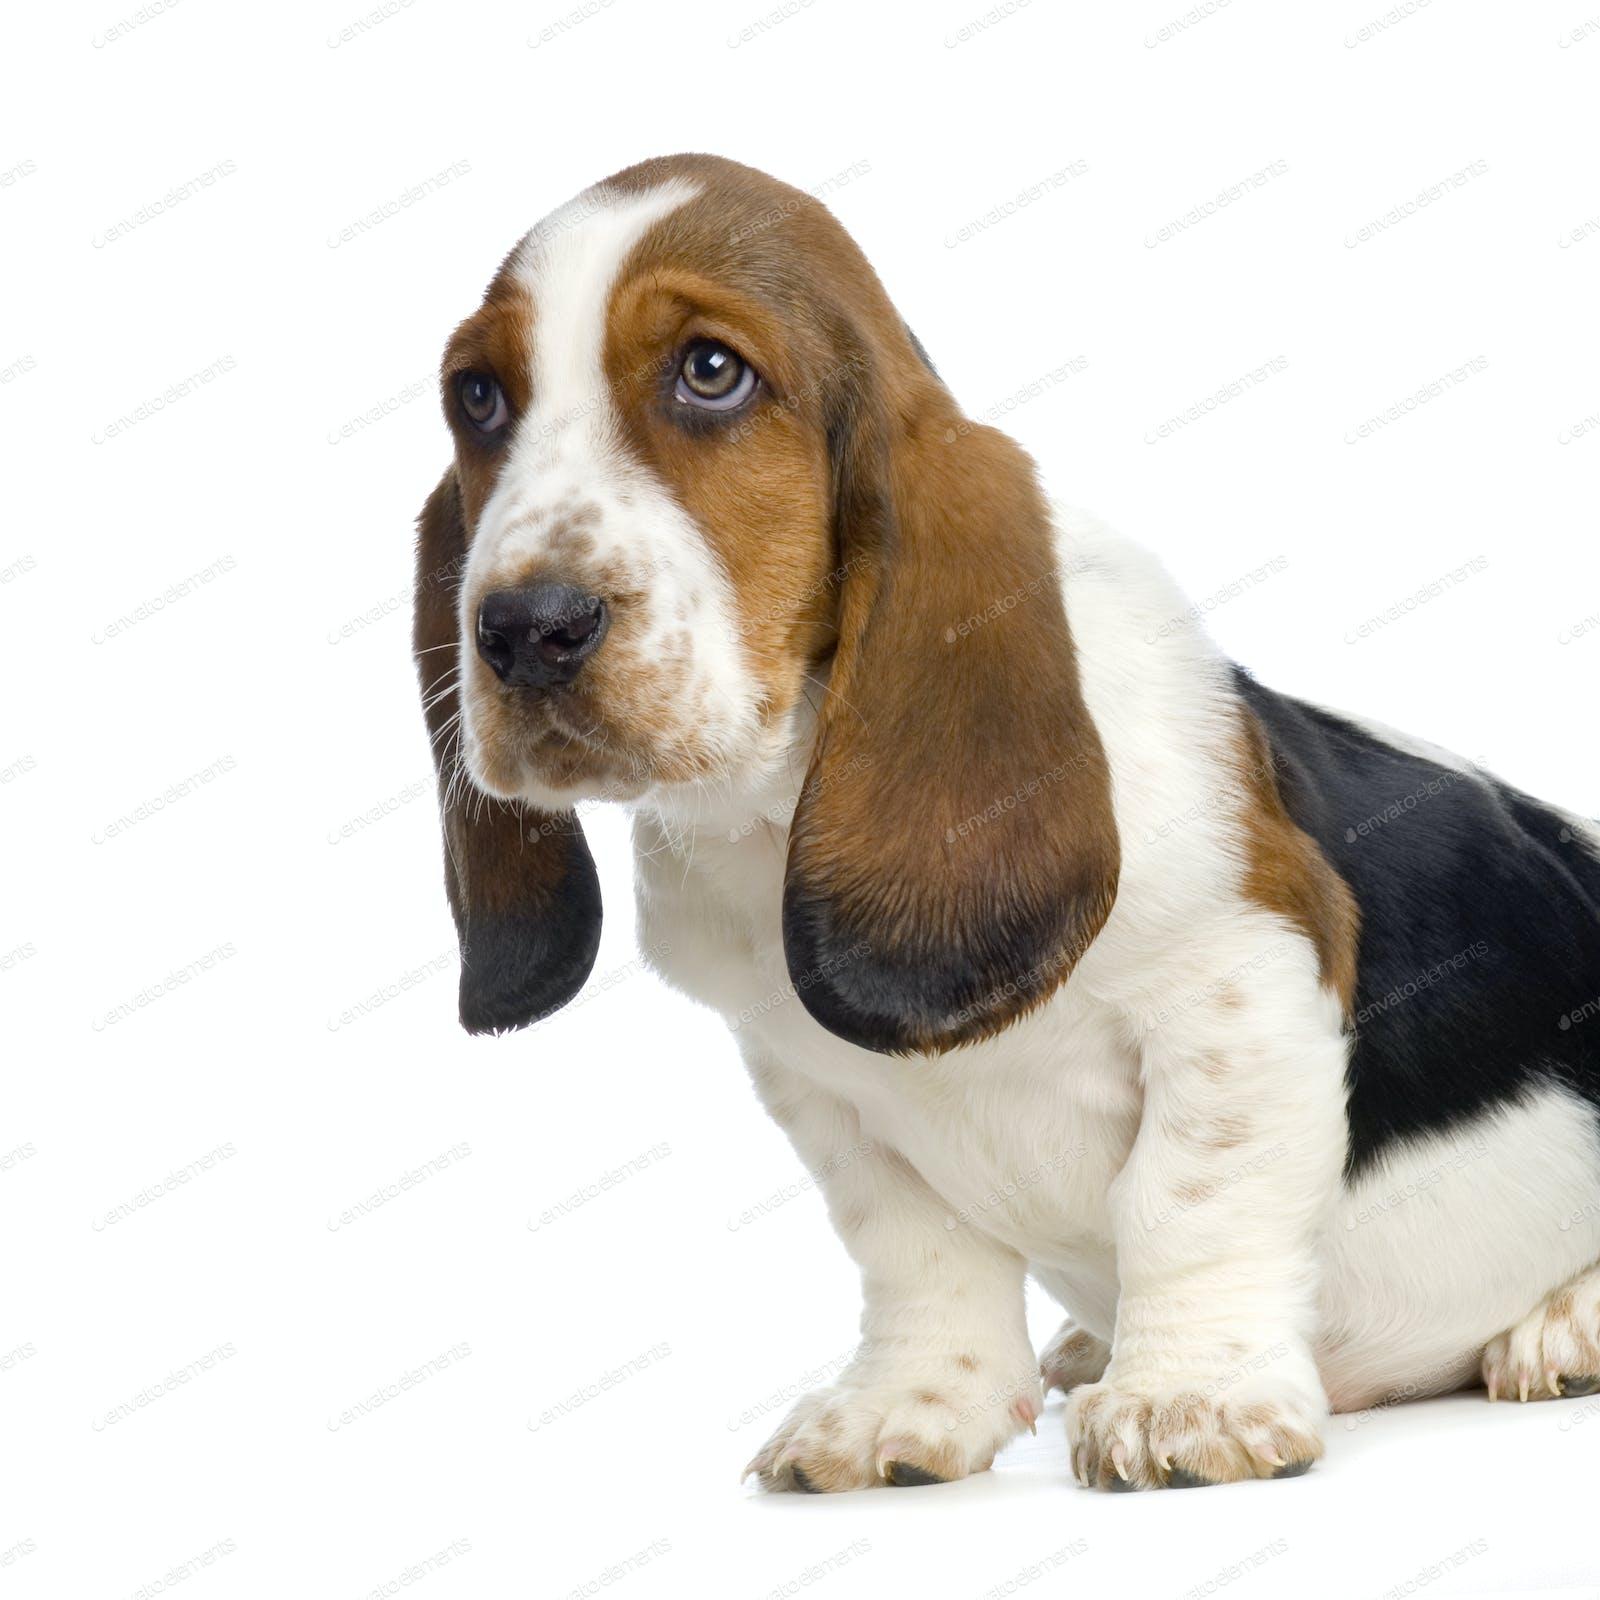 Basset Hound Puppy Hush Puppies Photo By Lifeonwhite On Envato Elements